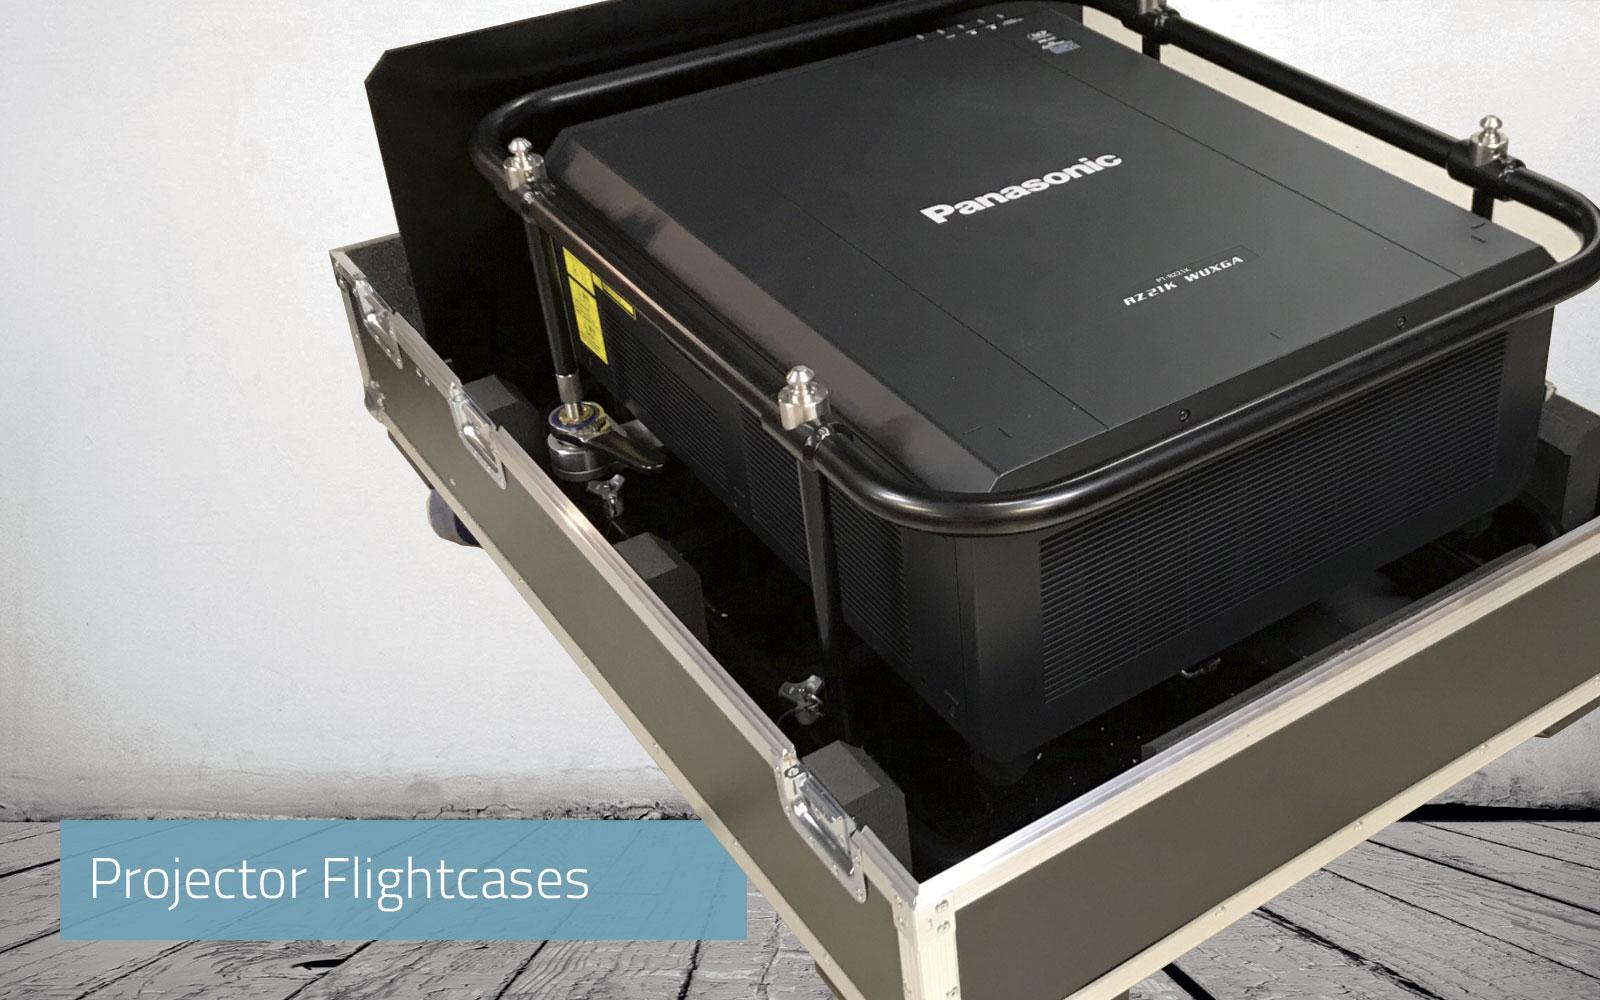 Projector Flightcases